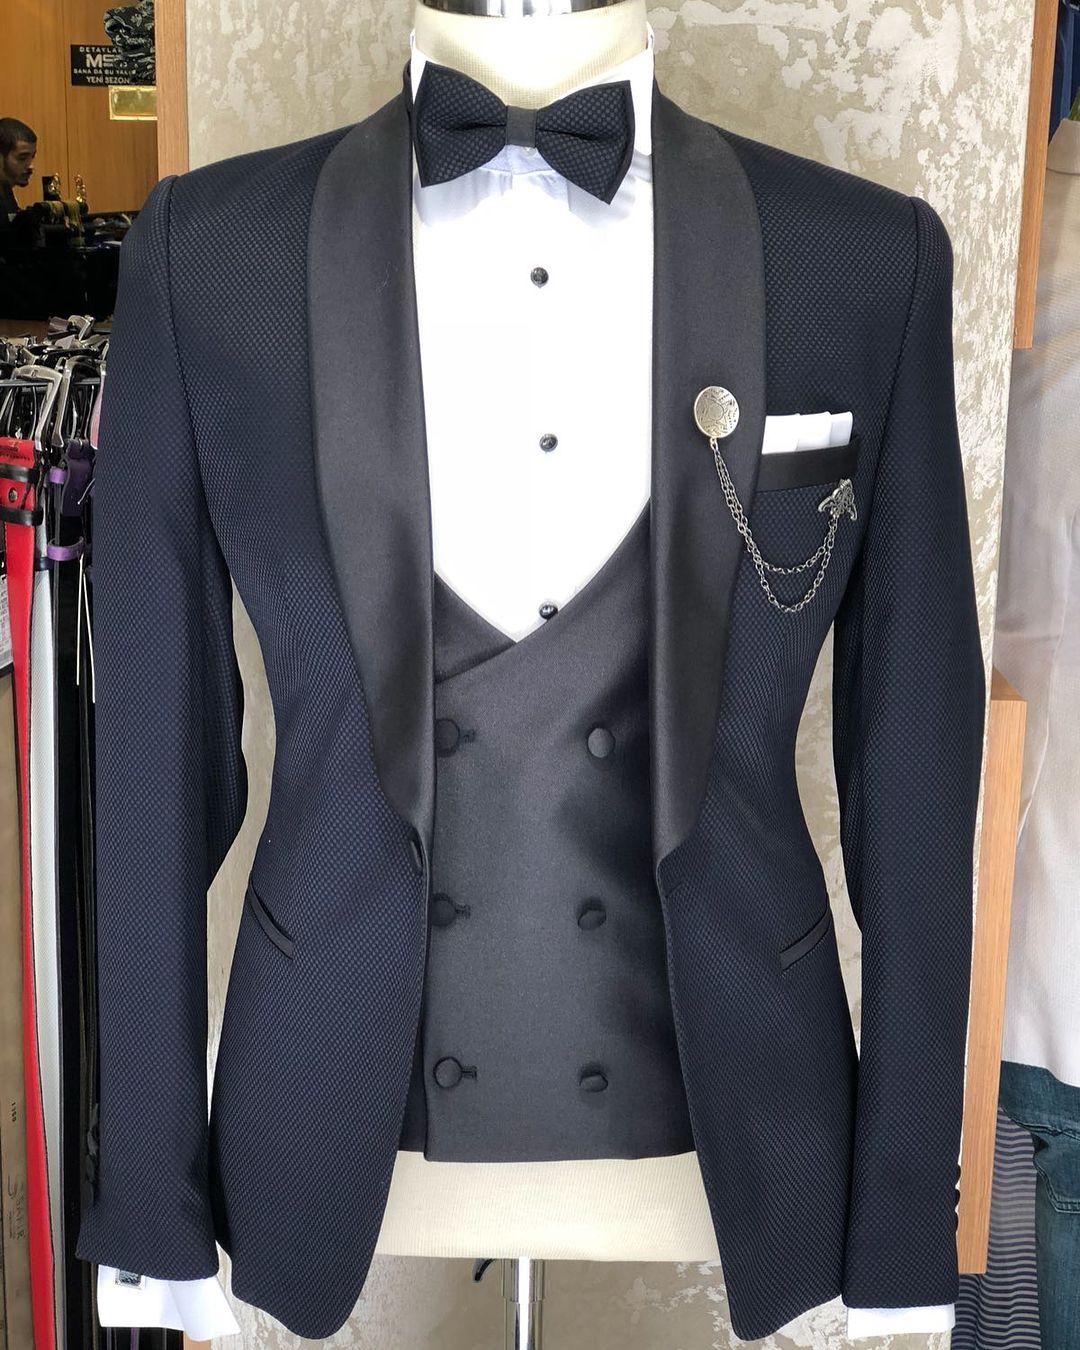 Cedric Navy Blue Slim Fit Tuxedo Wedding suits, Wedding